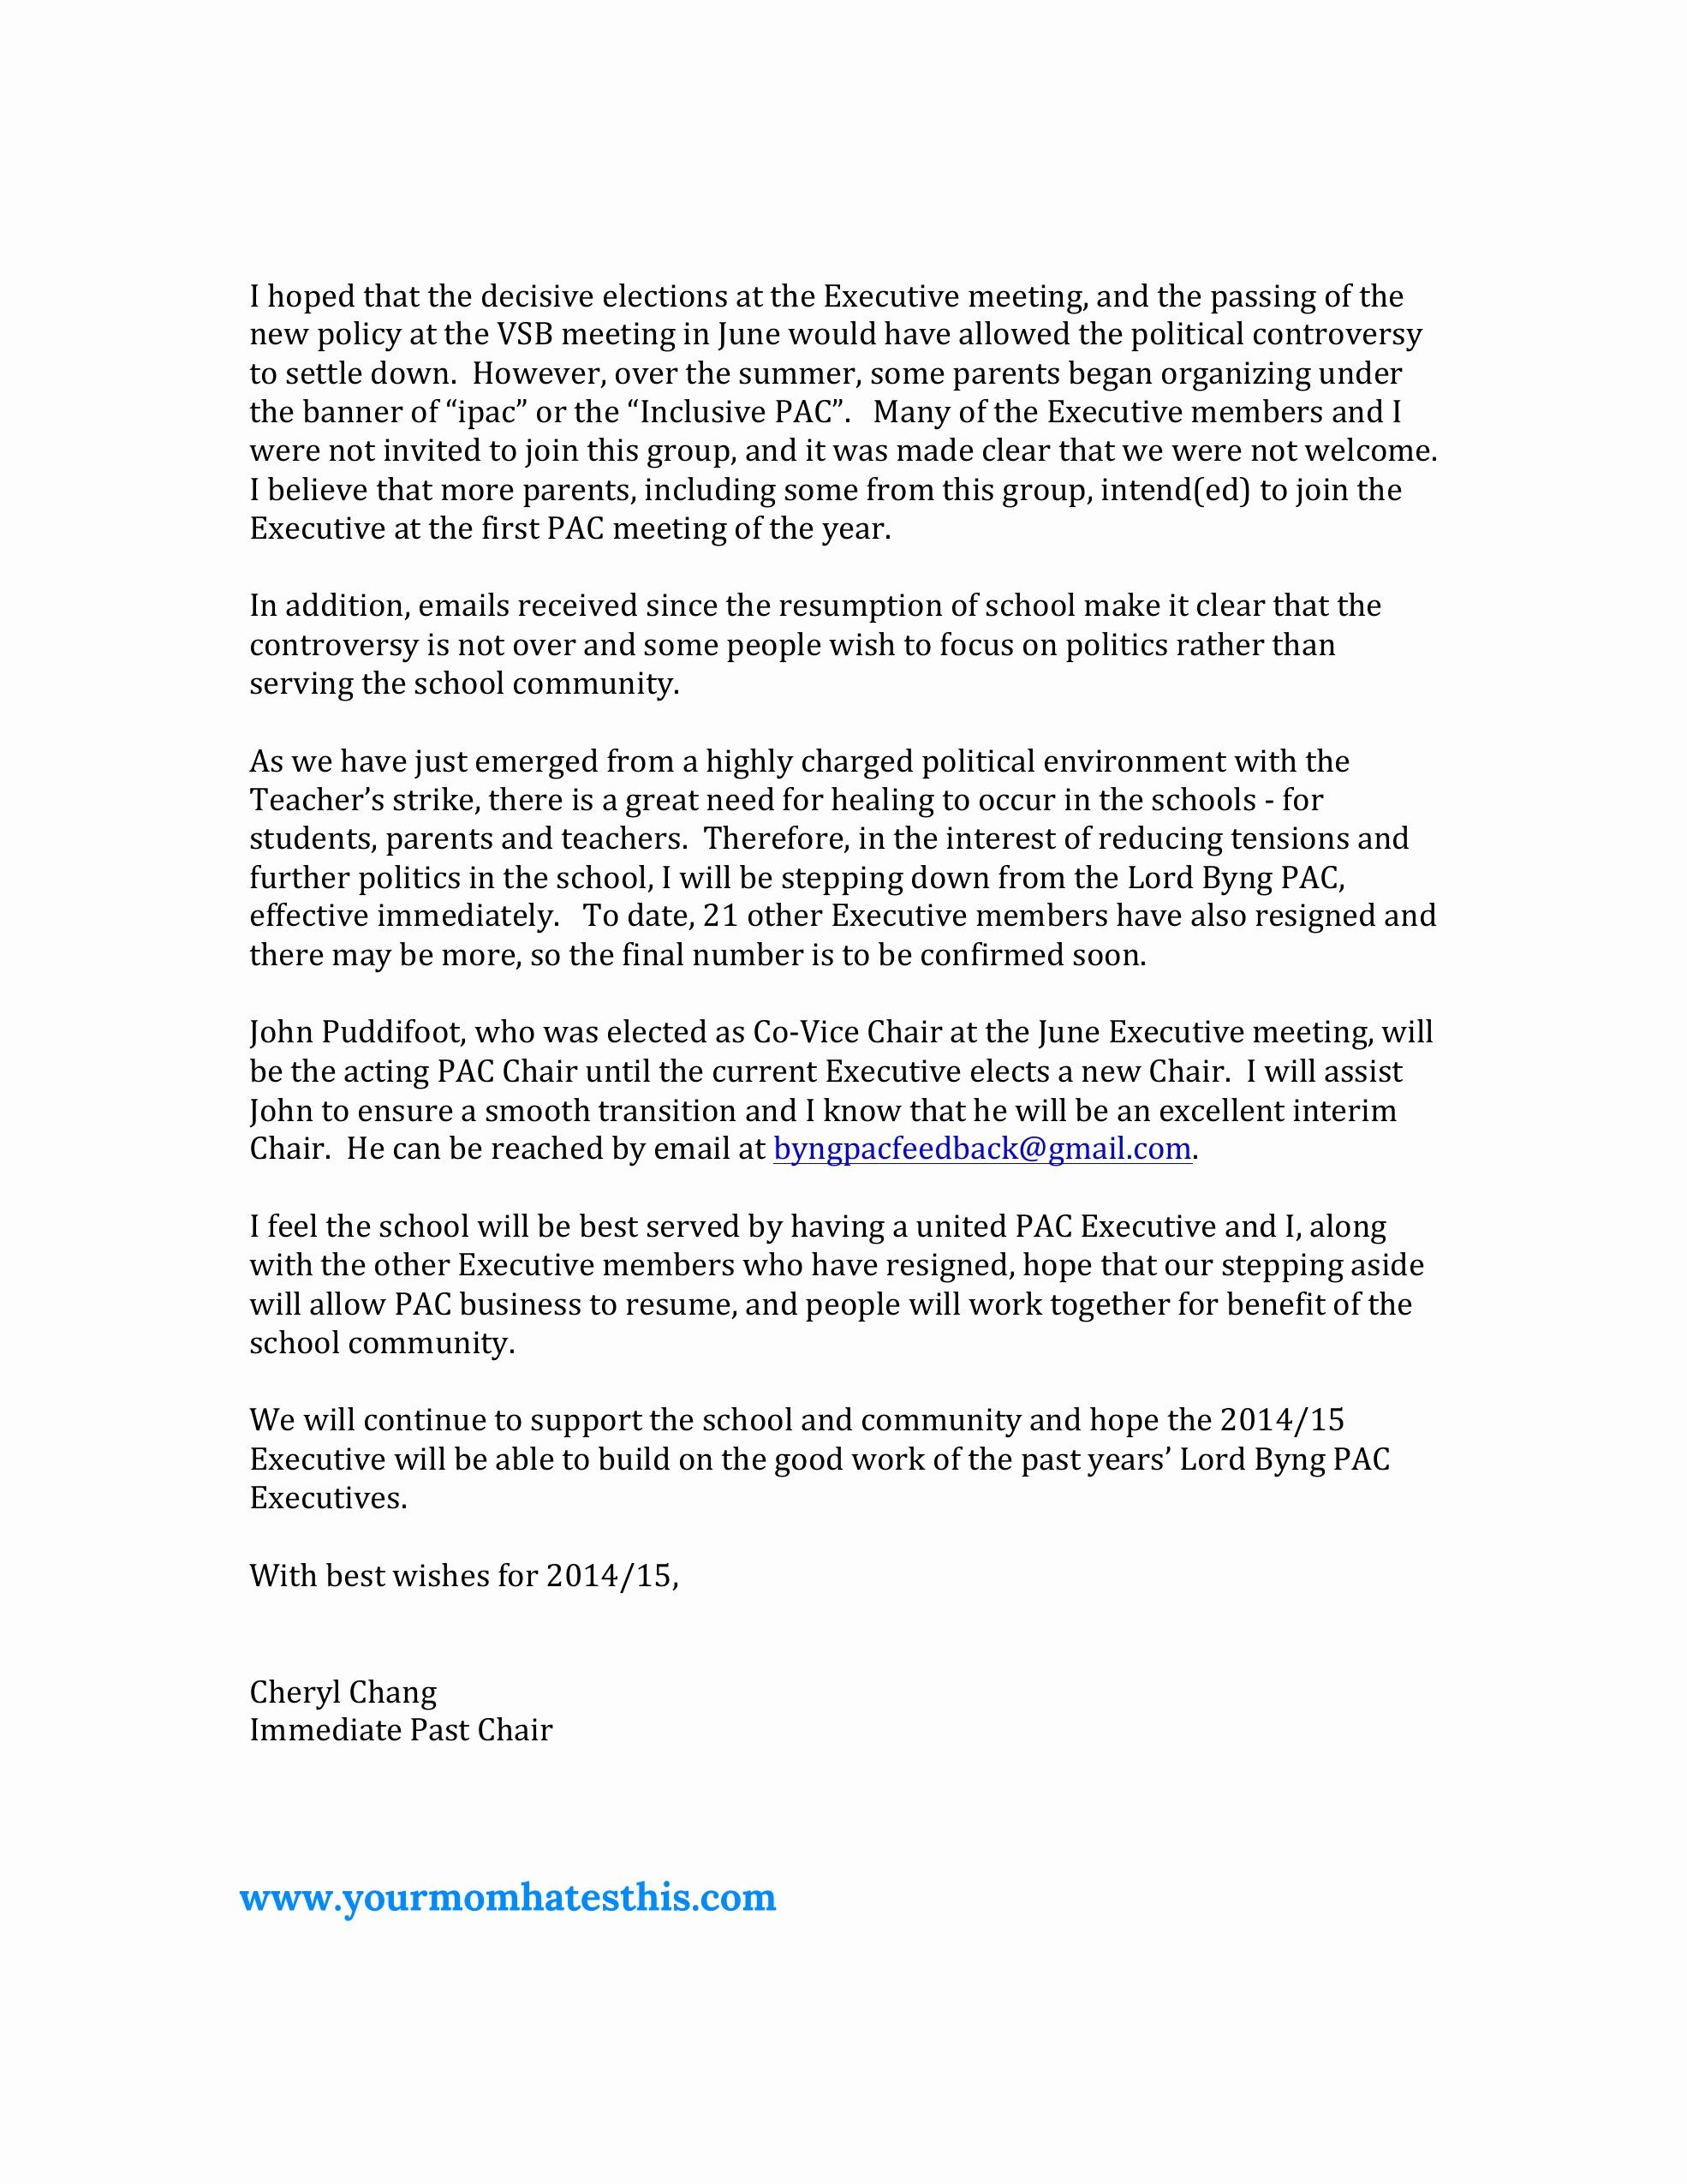 Resignation Letter Volunteer organization Elegant Dos and Don'ts for A Resignation Letter